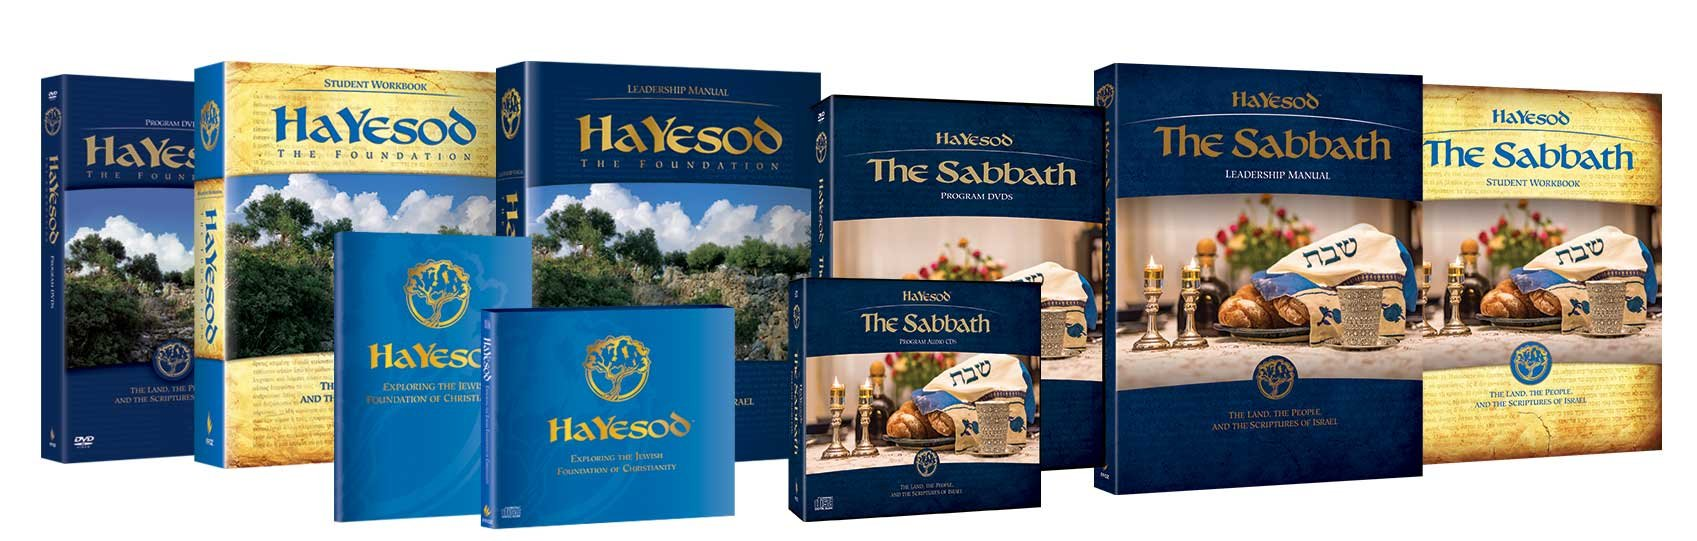 hy-foundation-sabbath-resources.jpg